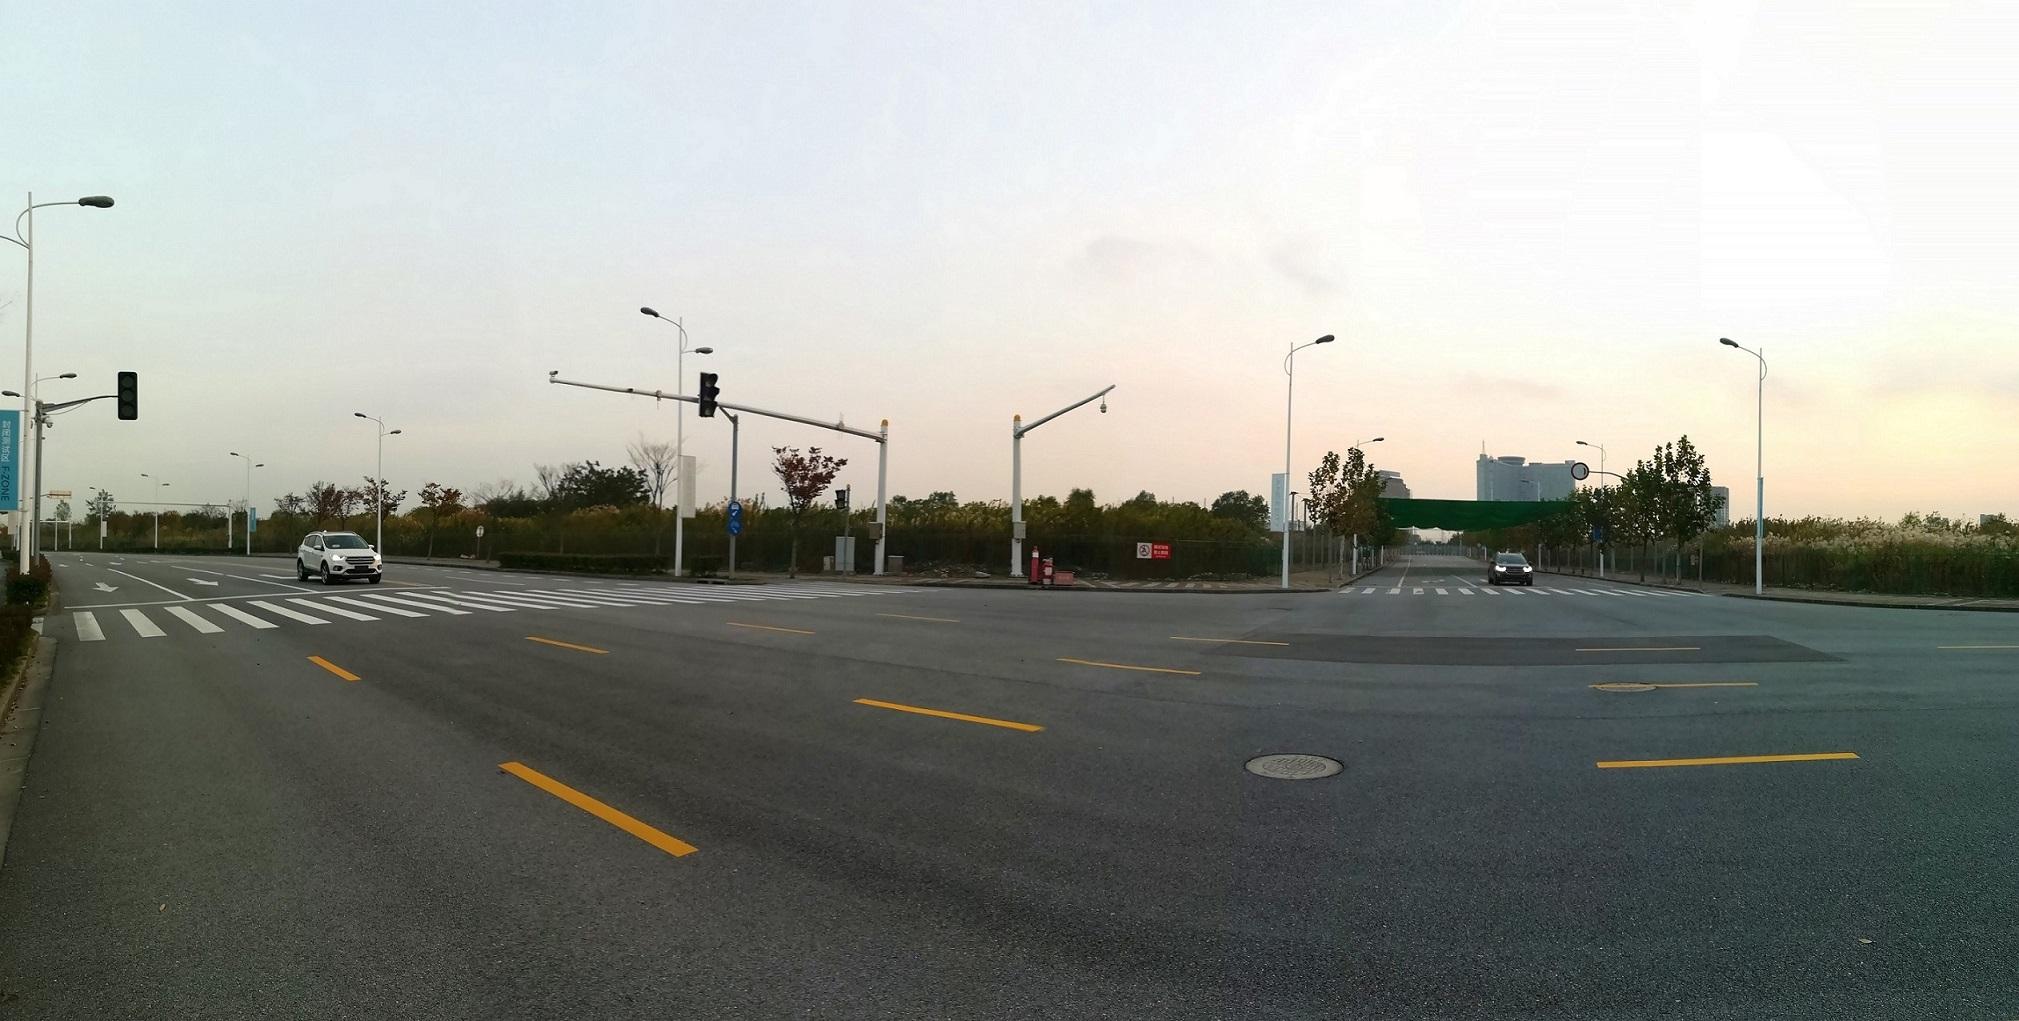 C-V2X技术能将城市内无线通信基础设施和车辆进行互联,从而为自动驾驶车辆的应用奠定基础,并改善车辆安全性能,提升道路通行效率